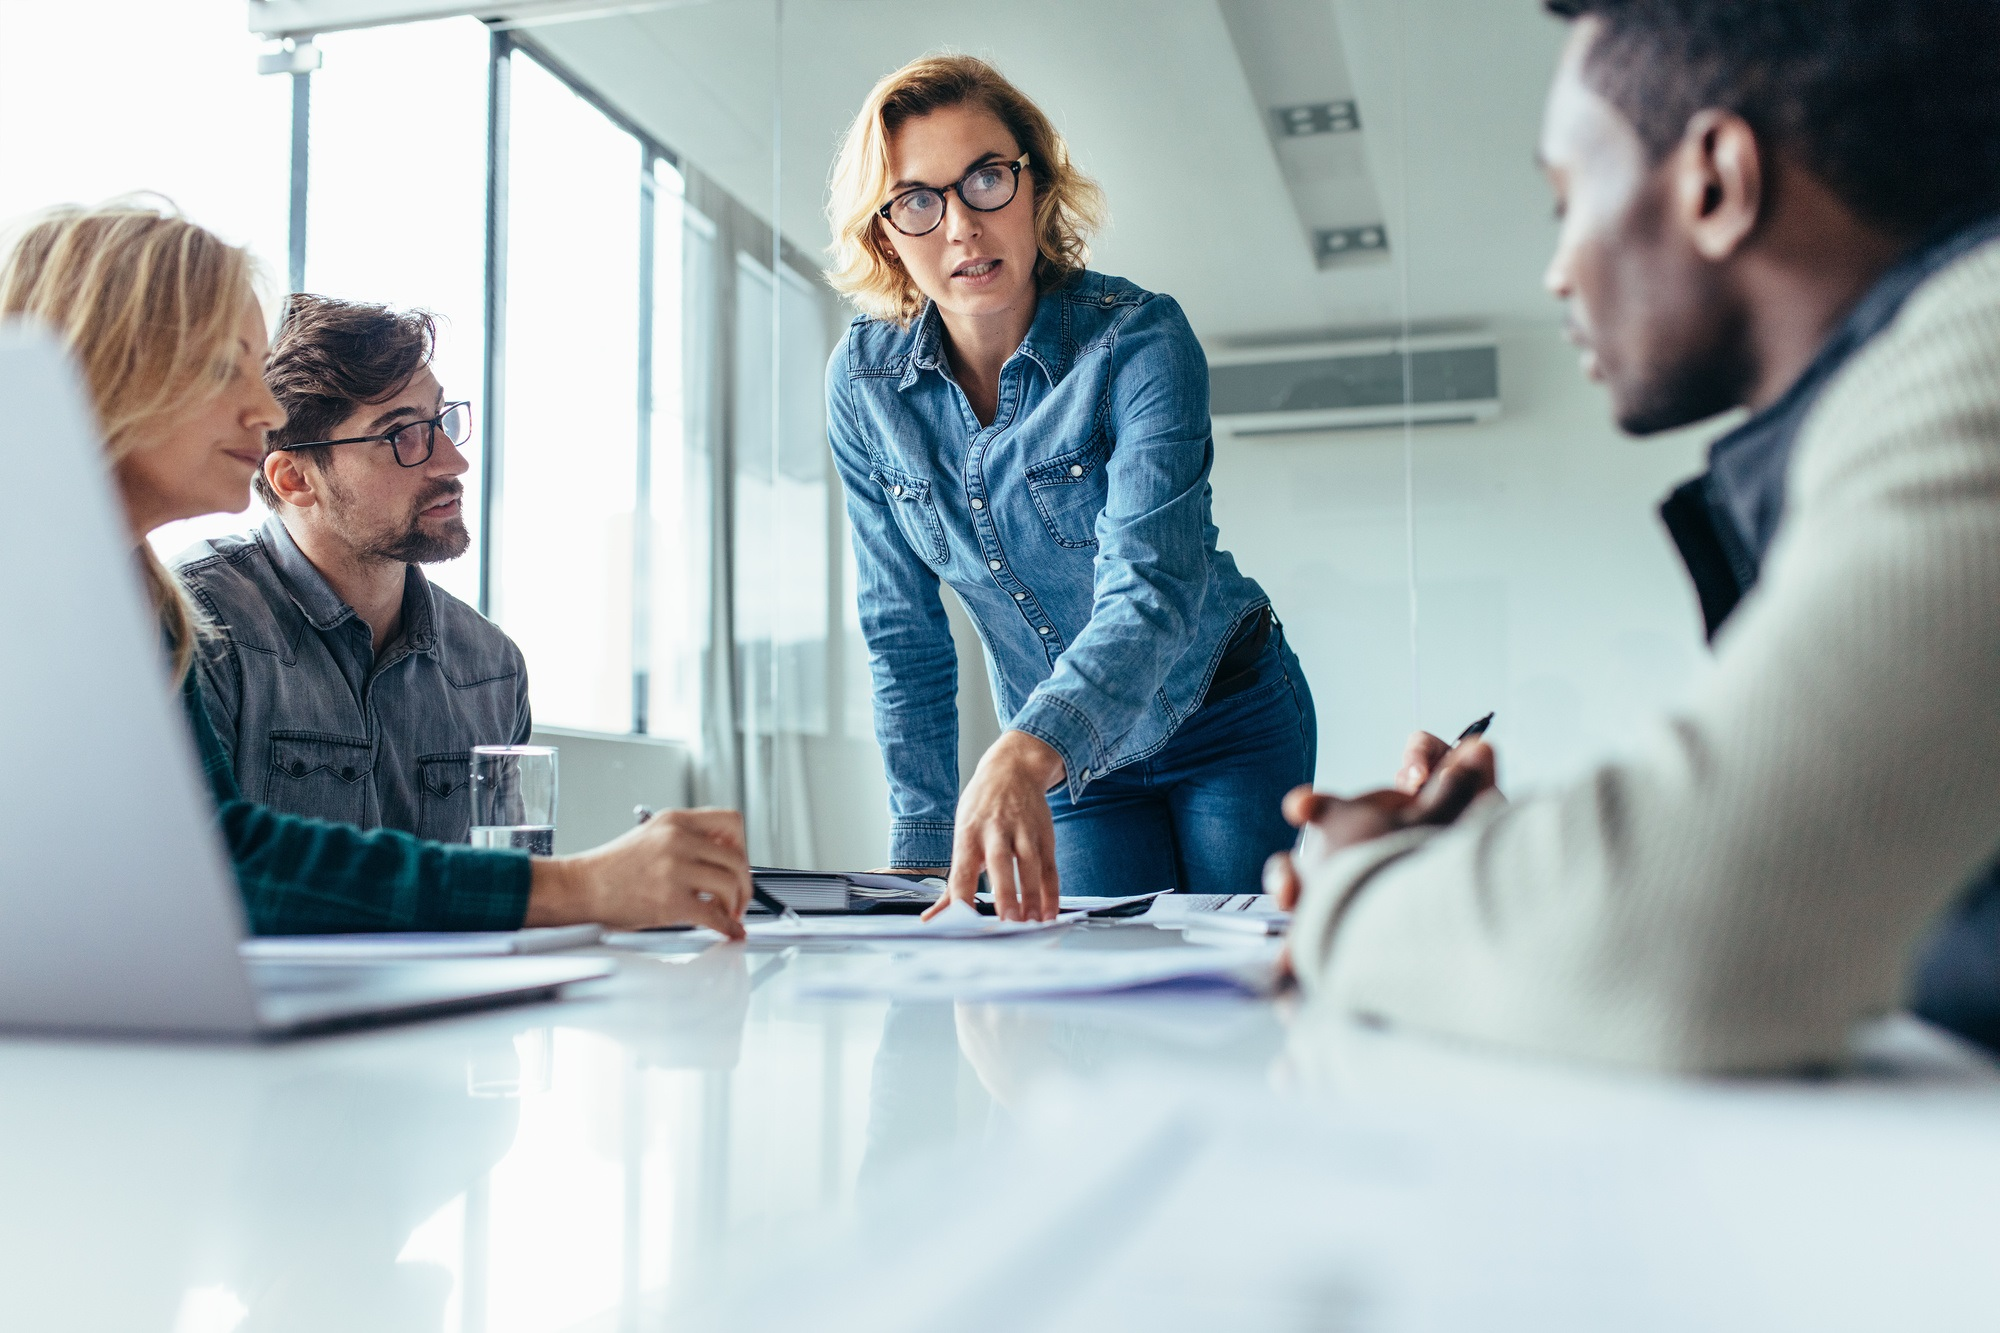 7 Business Metrics Every Company Should Track